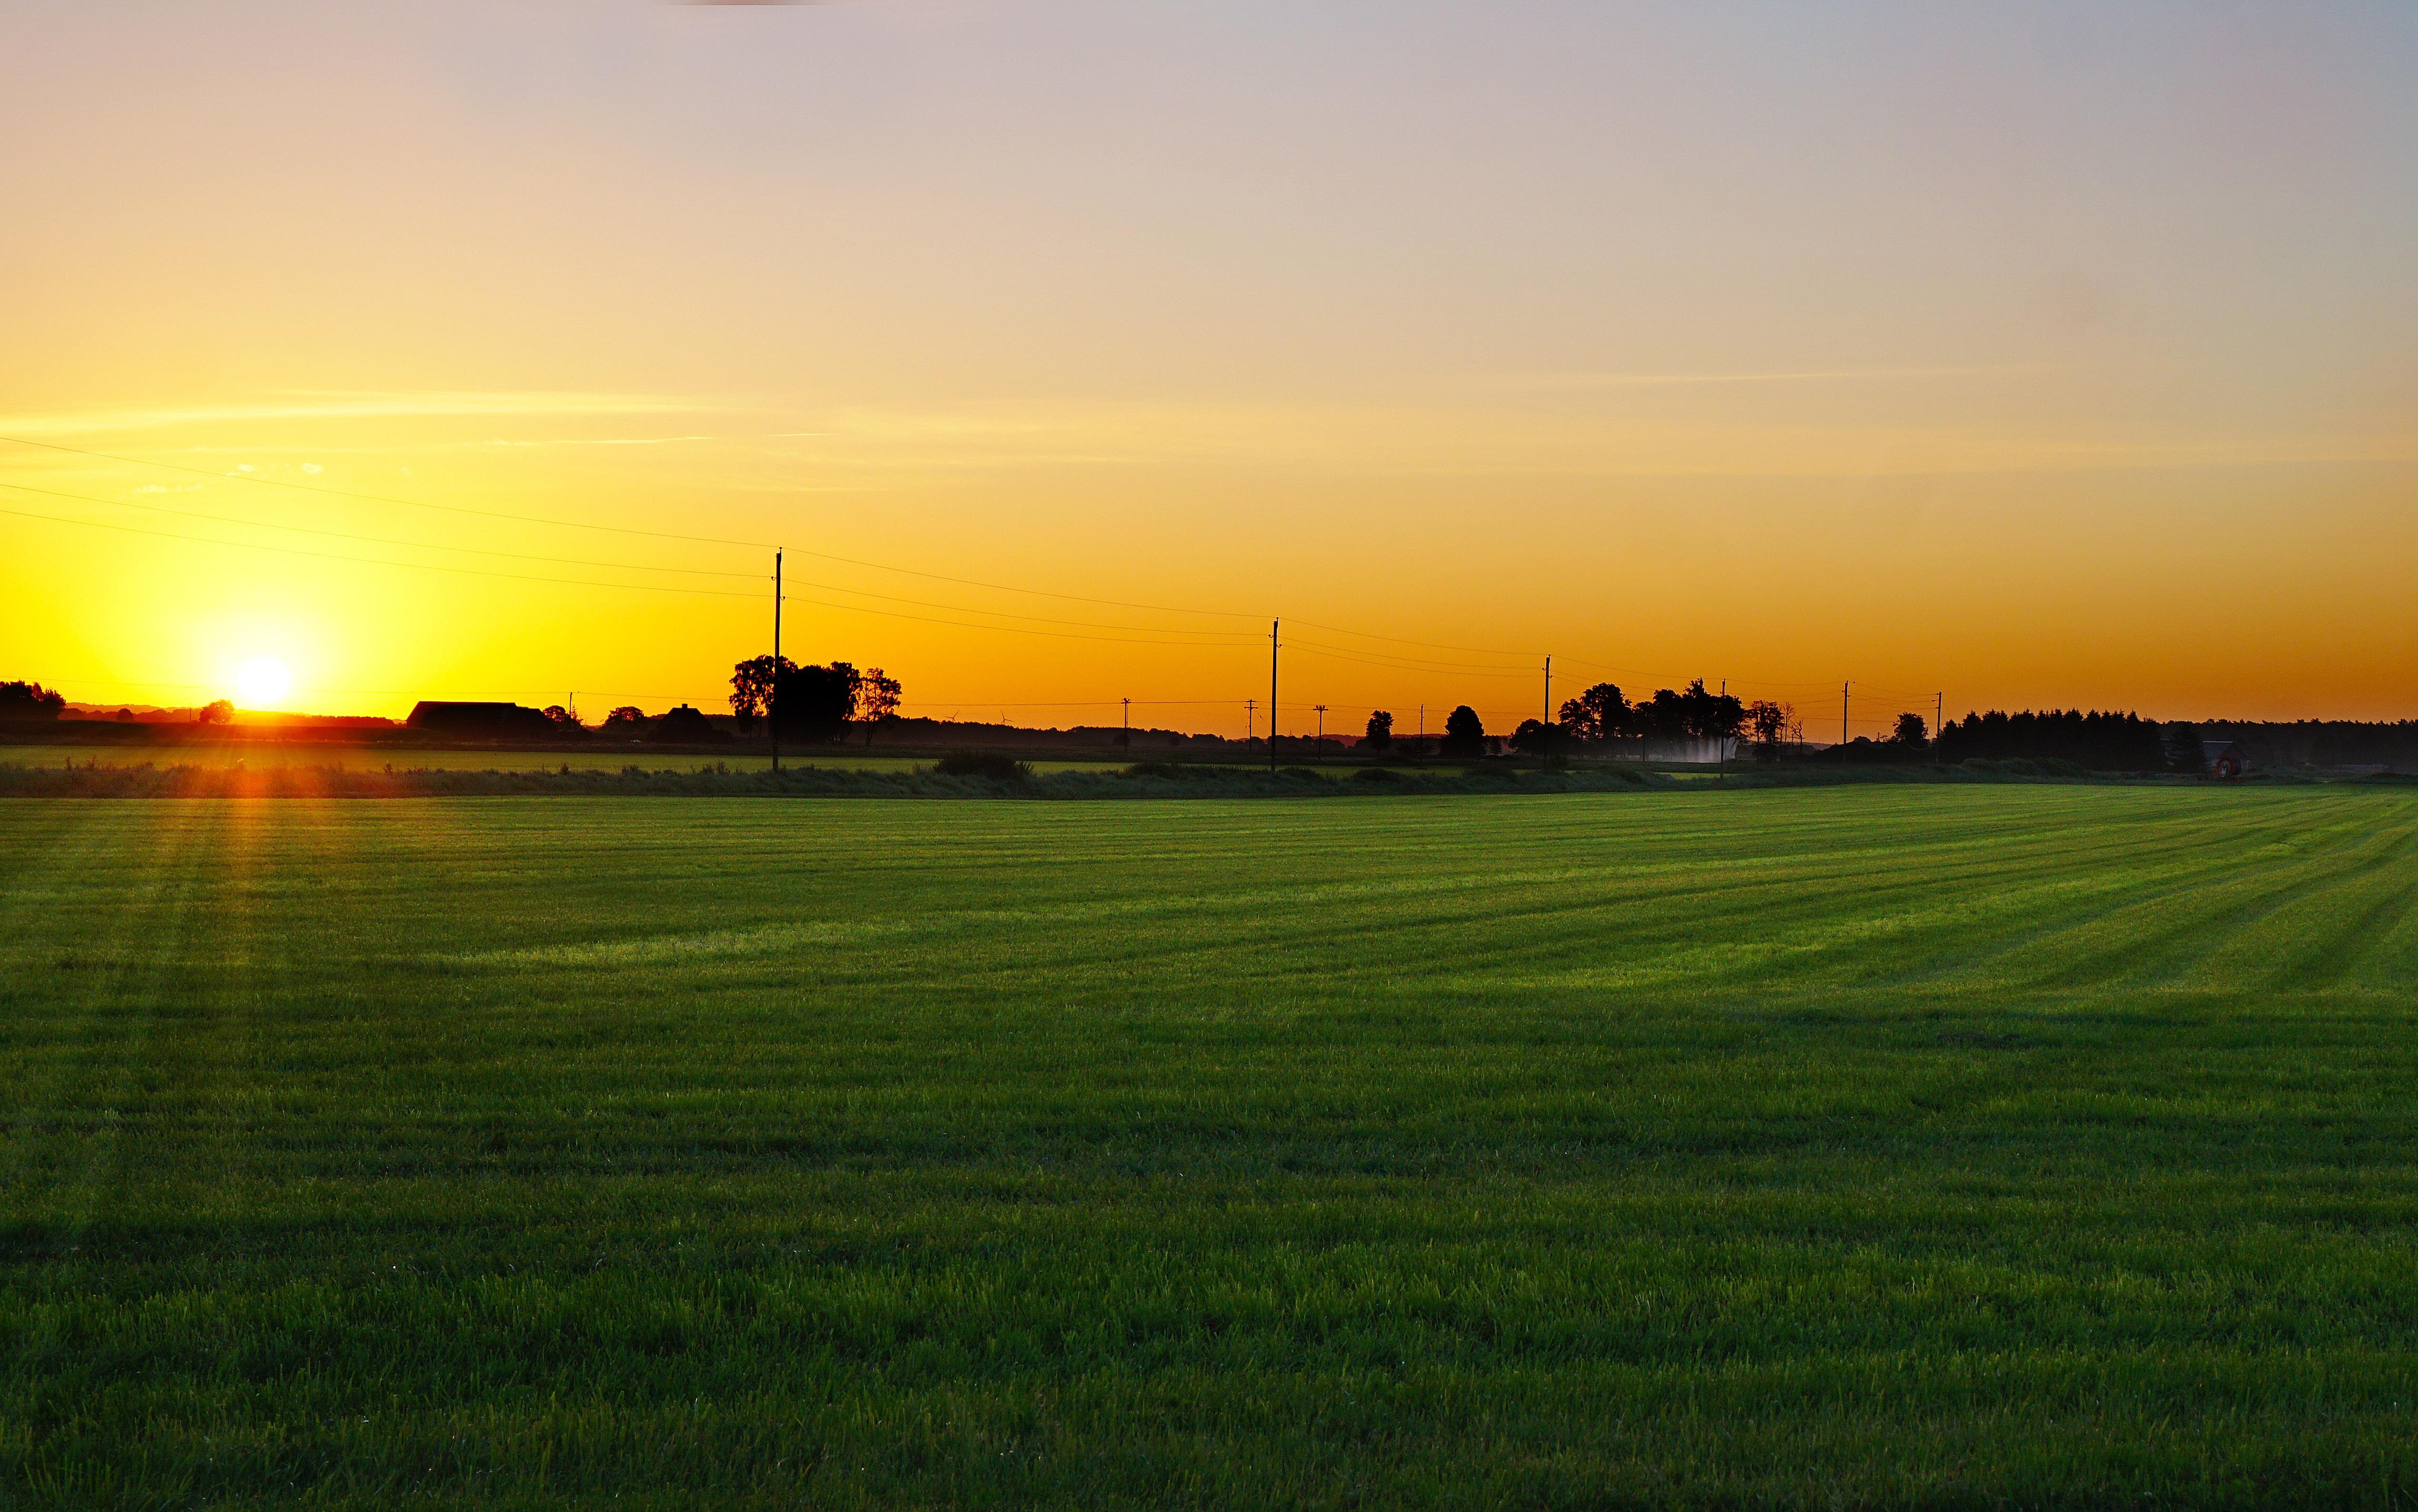 grass field sunrise. Fine Sunrise Free Images  Nature Grass Horizon Cloud Sun Sunrise Sunset Field  Prairie Sunlight Hill Dawn Dusk Evening Agriculture Solar Plain Bed  In Grass Field Sunrise A